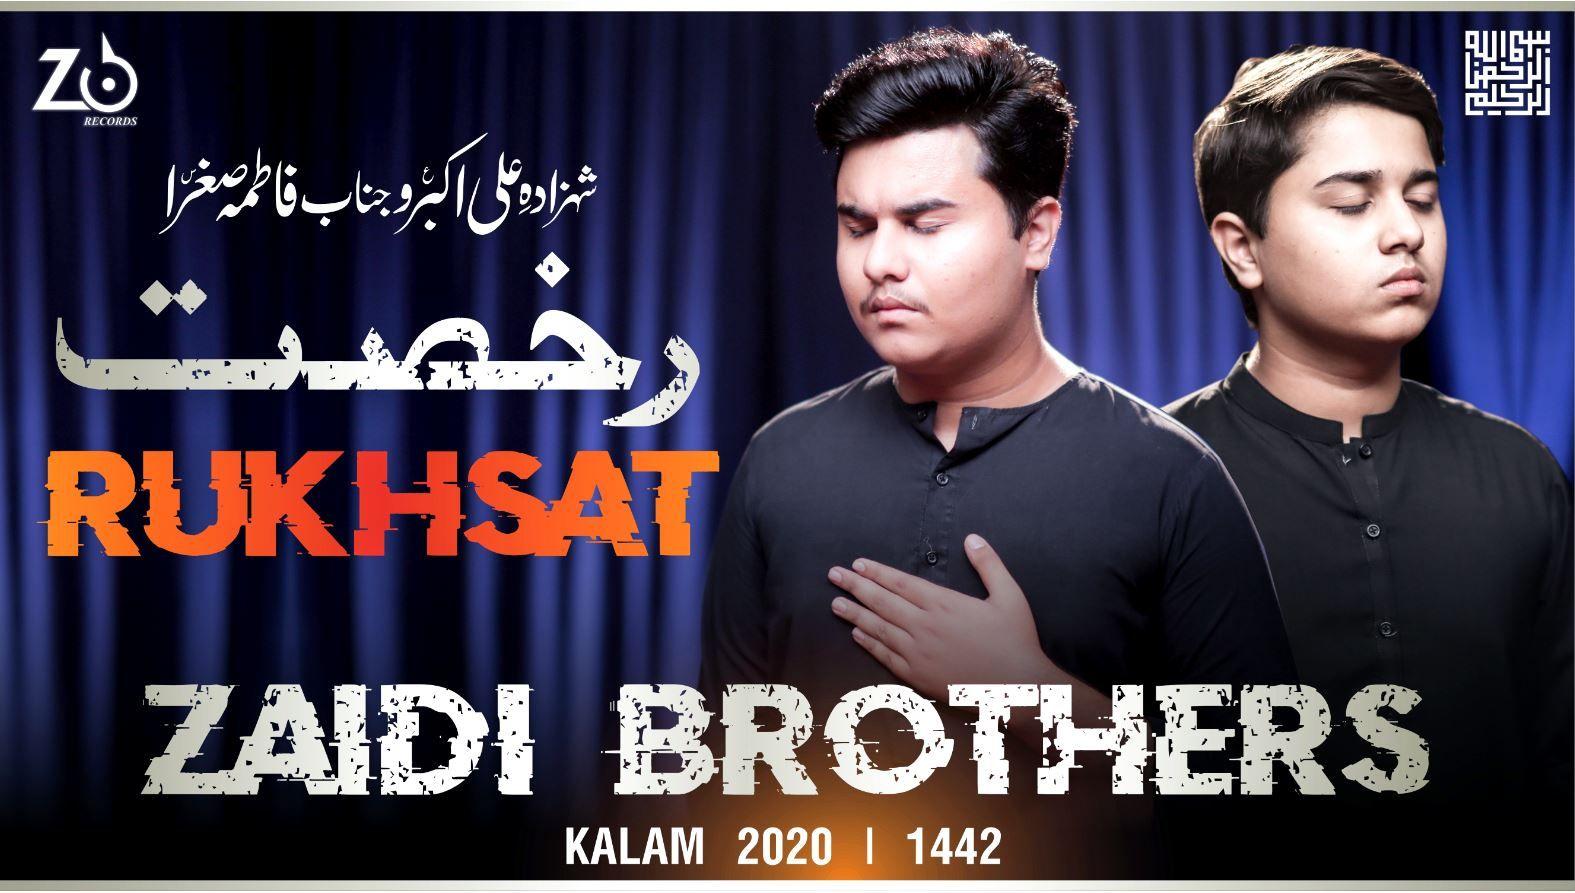 Muharrum Noha 1442 / 2020 | Rukhsat | Zaidi Brothers | Mola Ali Akbar A.S & Bibi Sughra S.A